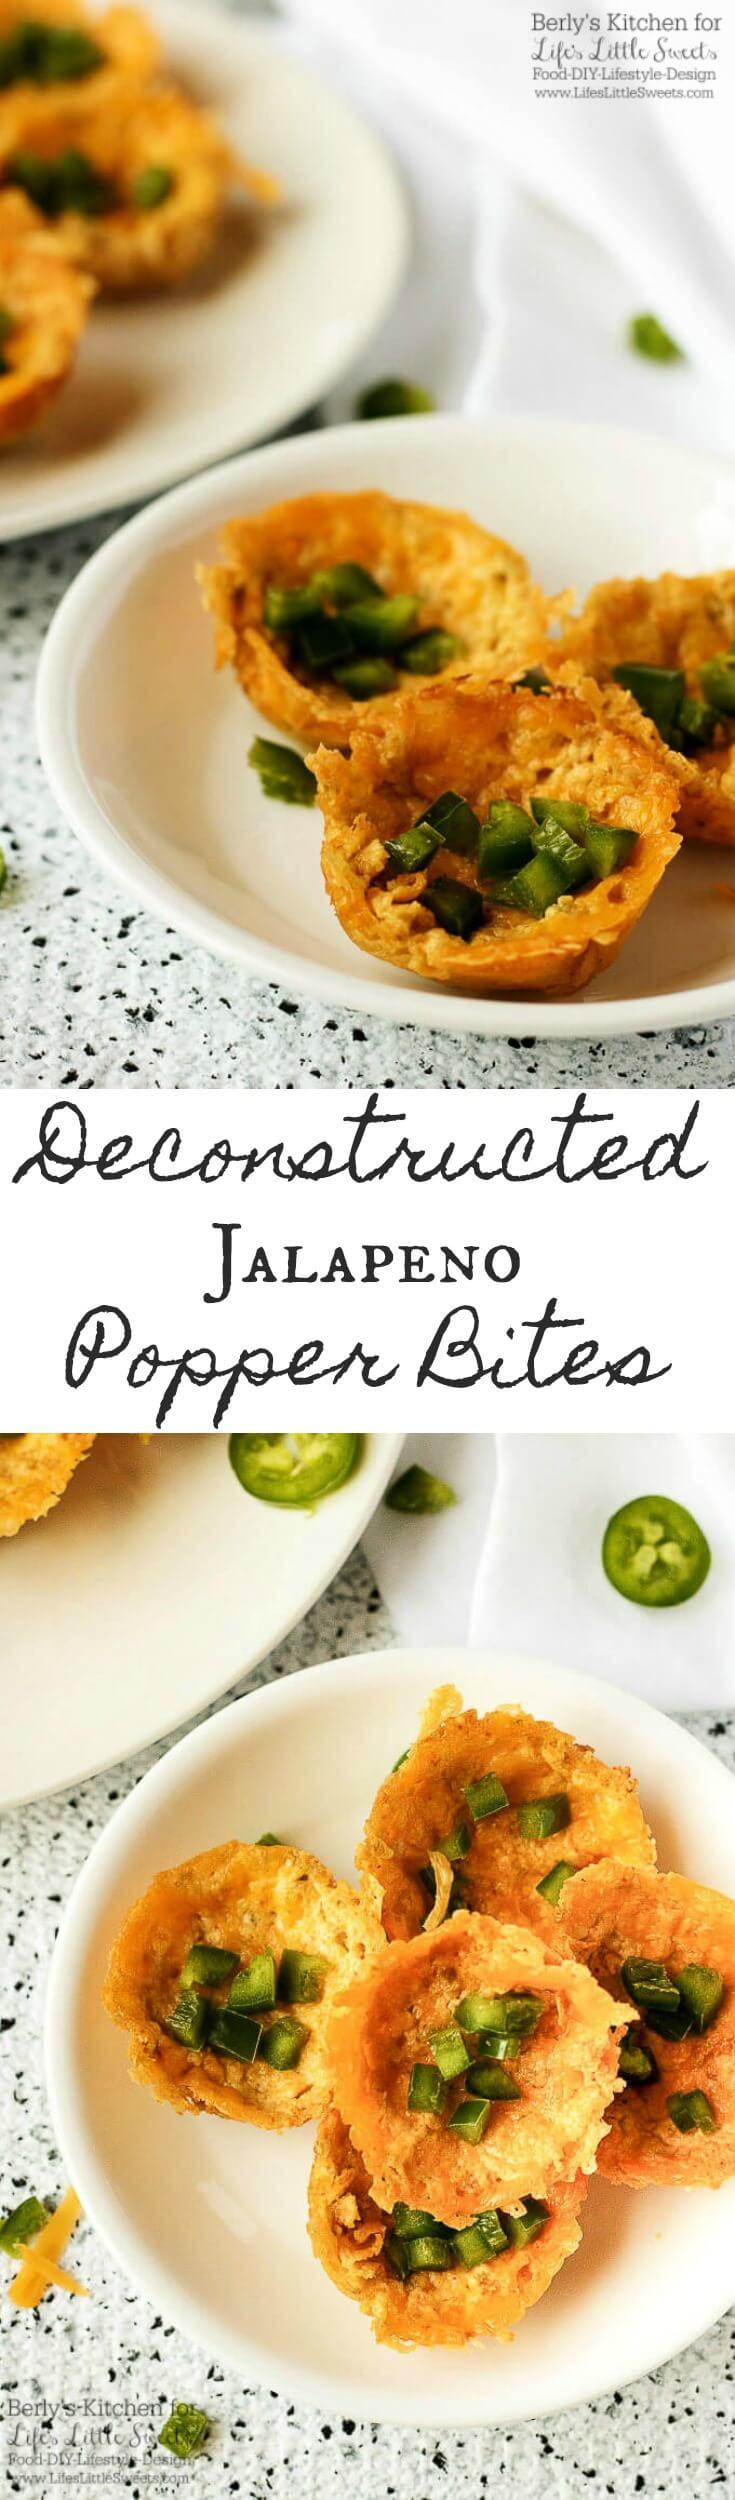 Deconstructed Jalapeno Popper Bites www.lifeslittlesweets.com